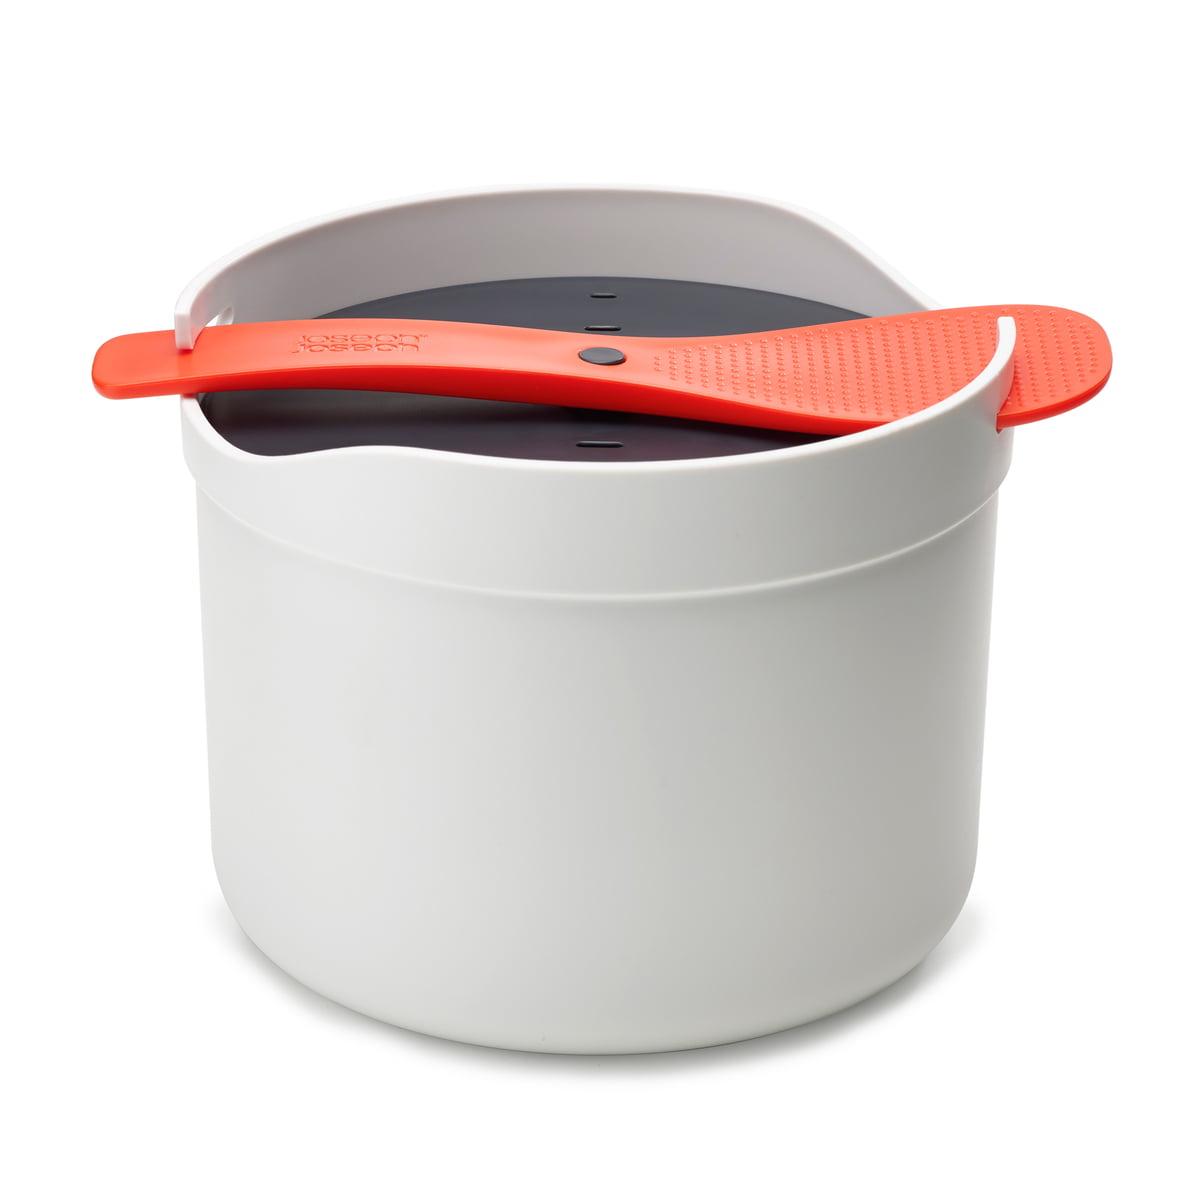 Joseph Joseph - M-Cuisine Mikrowellen-Reiskocher   Küche und Esszimmer > Küchenelektrogeräte > Mikrowellen   Joseph Joseph